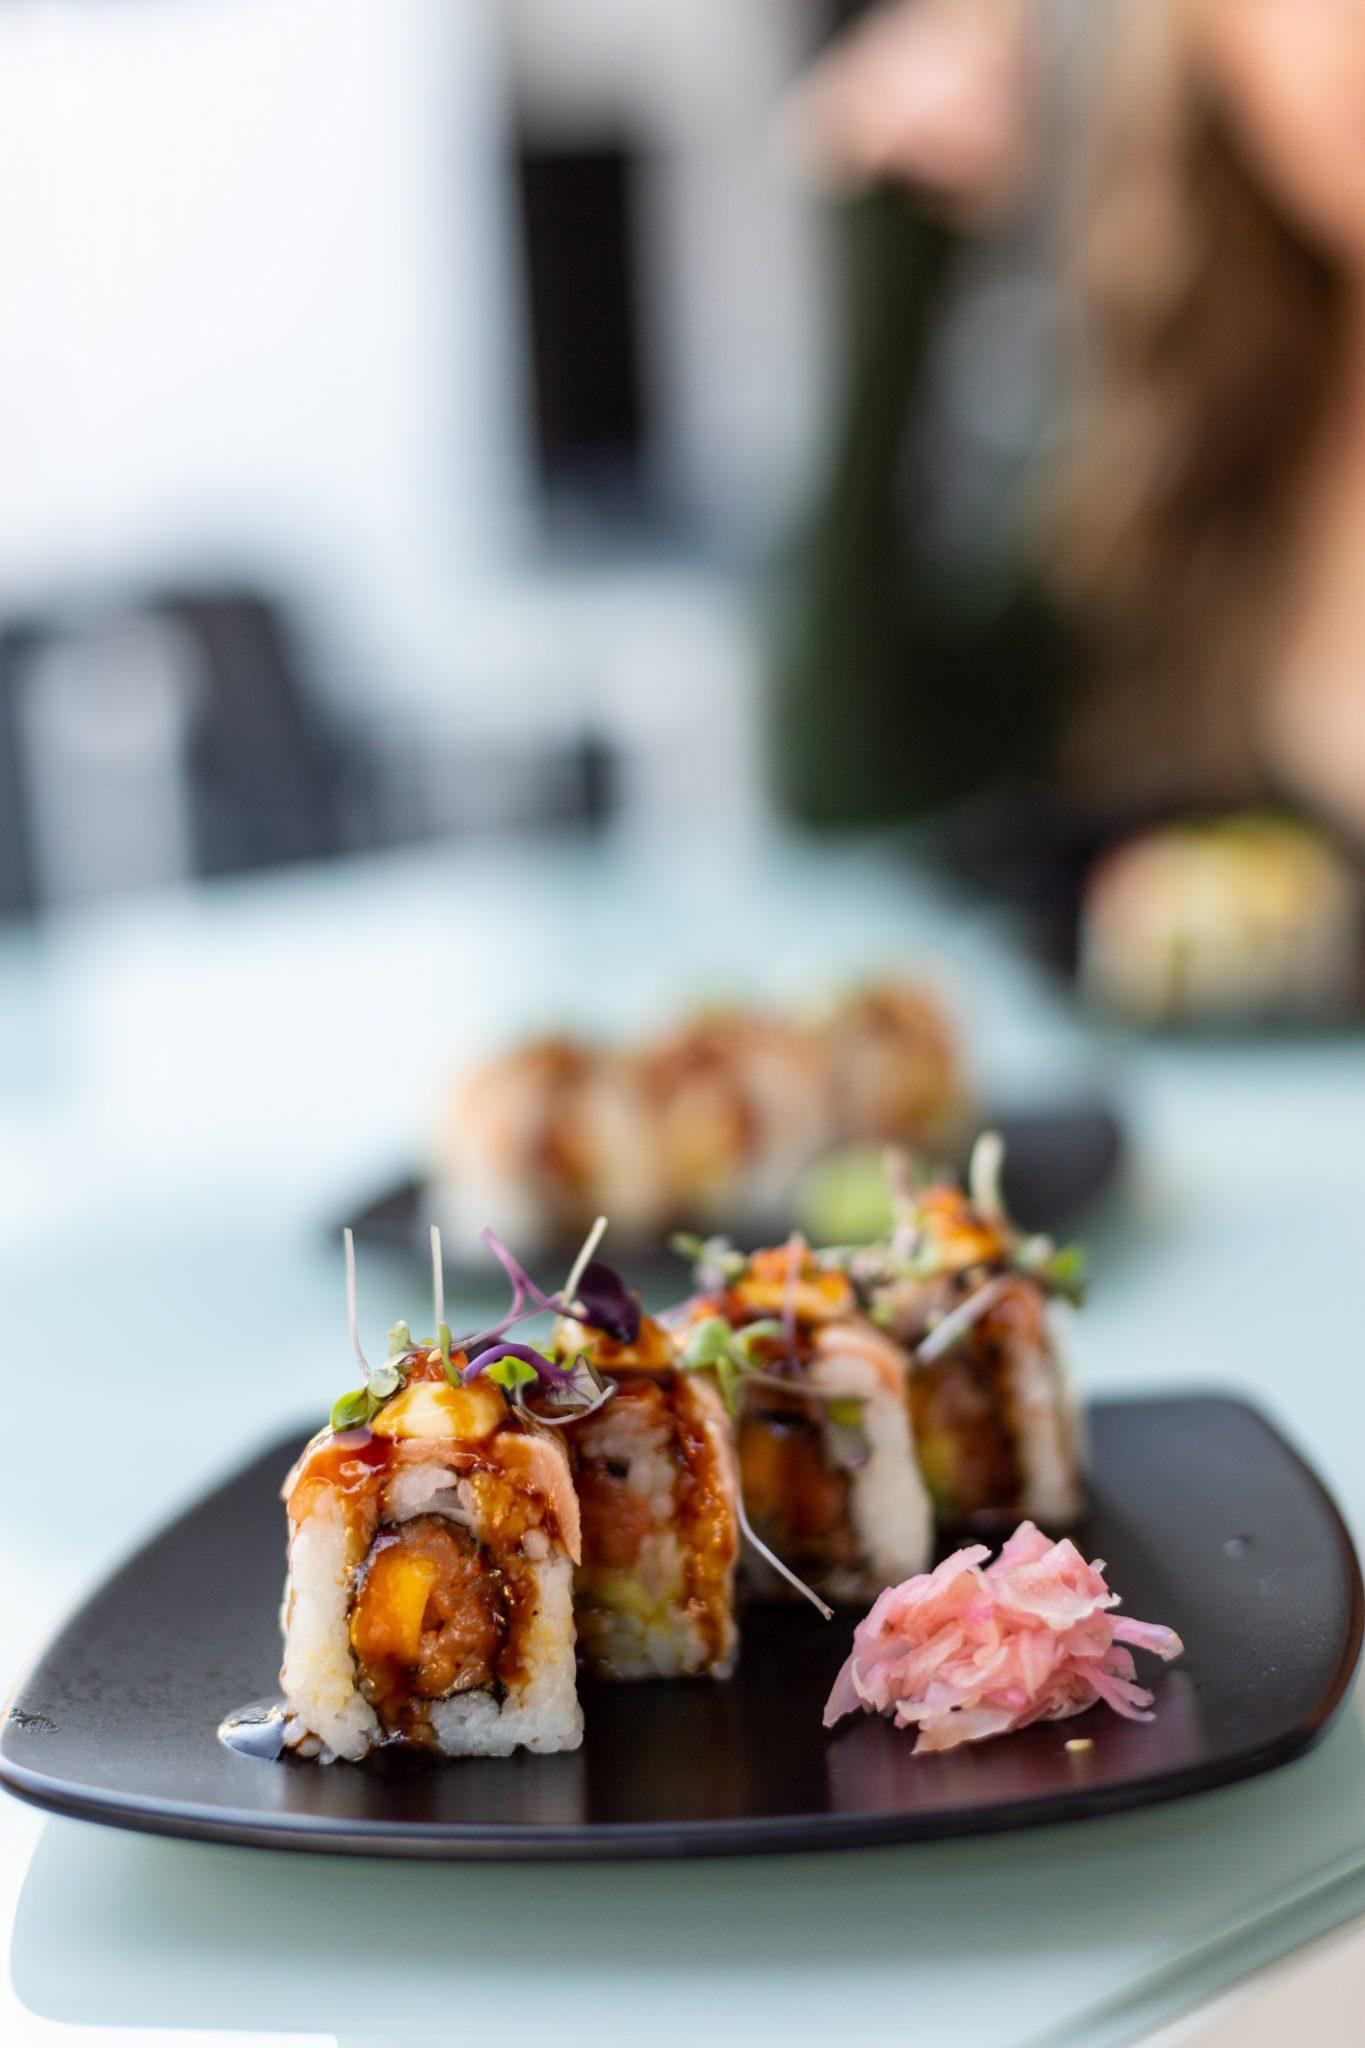 Japanese/Peruvian fusion-style sushi at Maaya, Eye Bar Loop Street Cape Town  Sonia Cabano blog eatdrinkcapetown